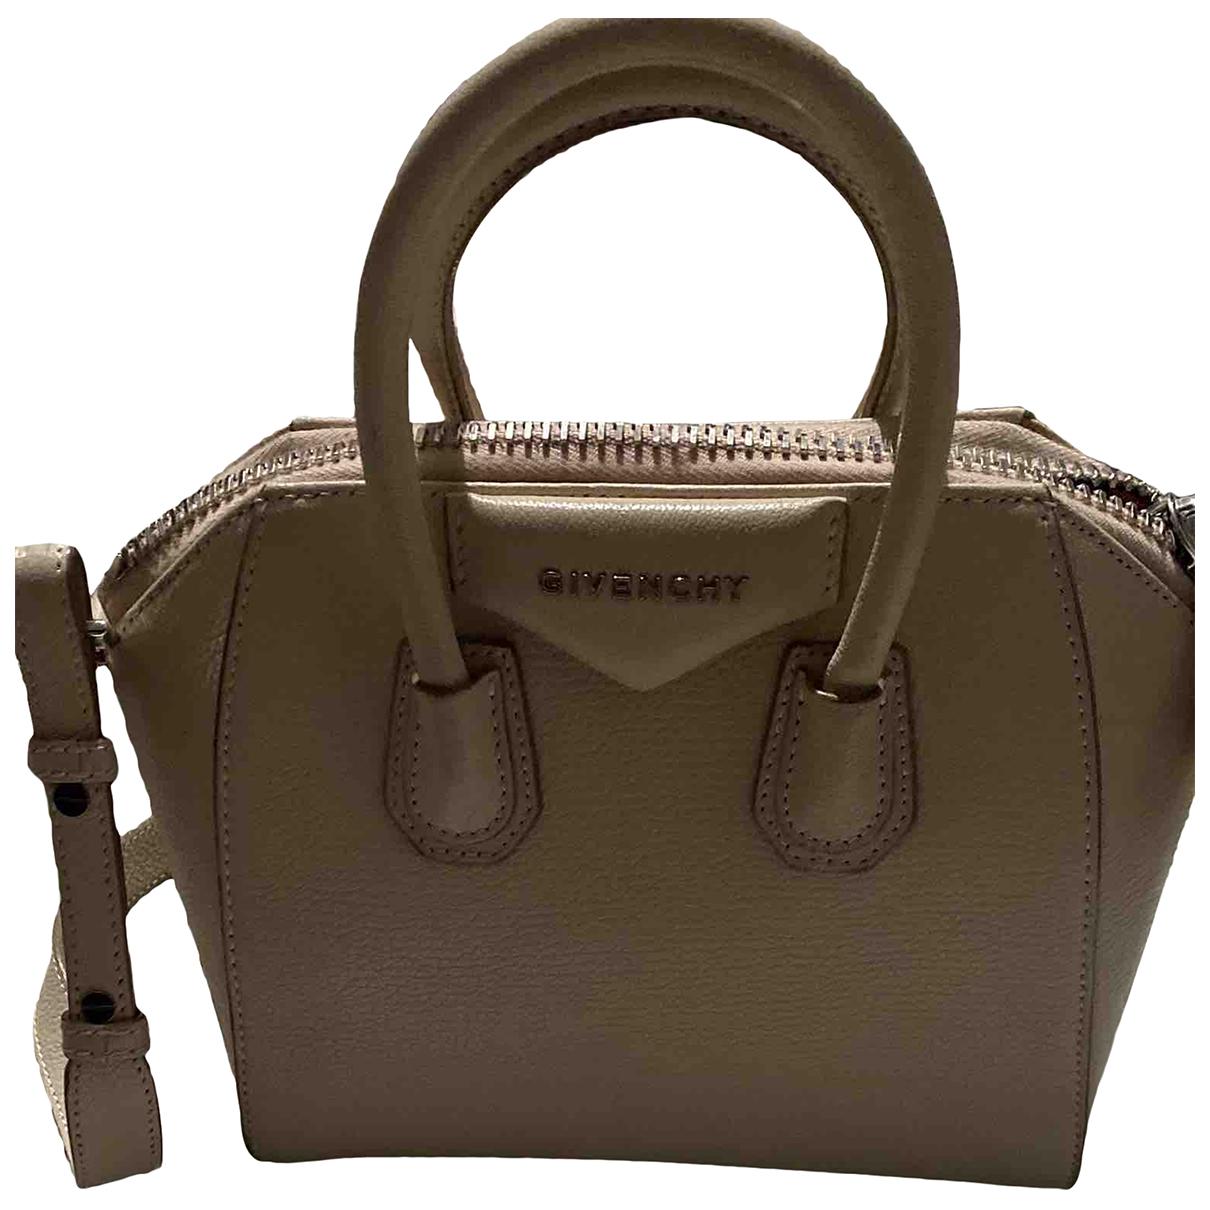 Givenchy - Sac a main Antigona pour femme en cuir - beige